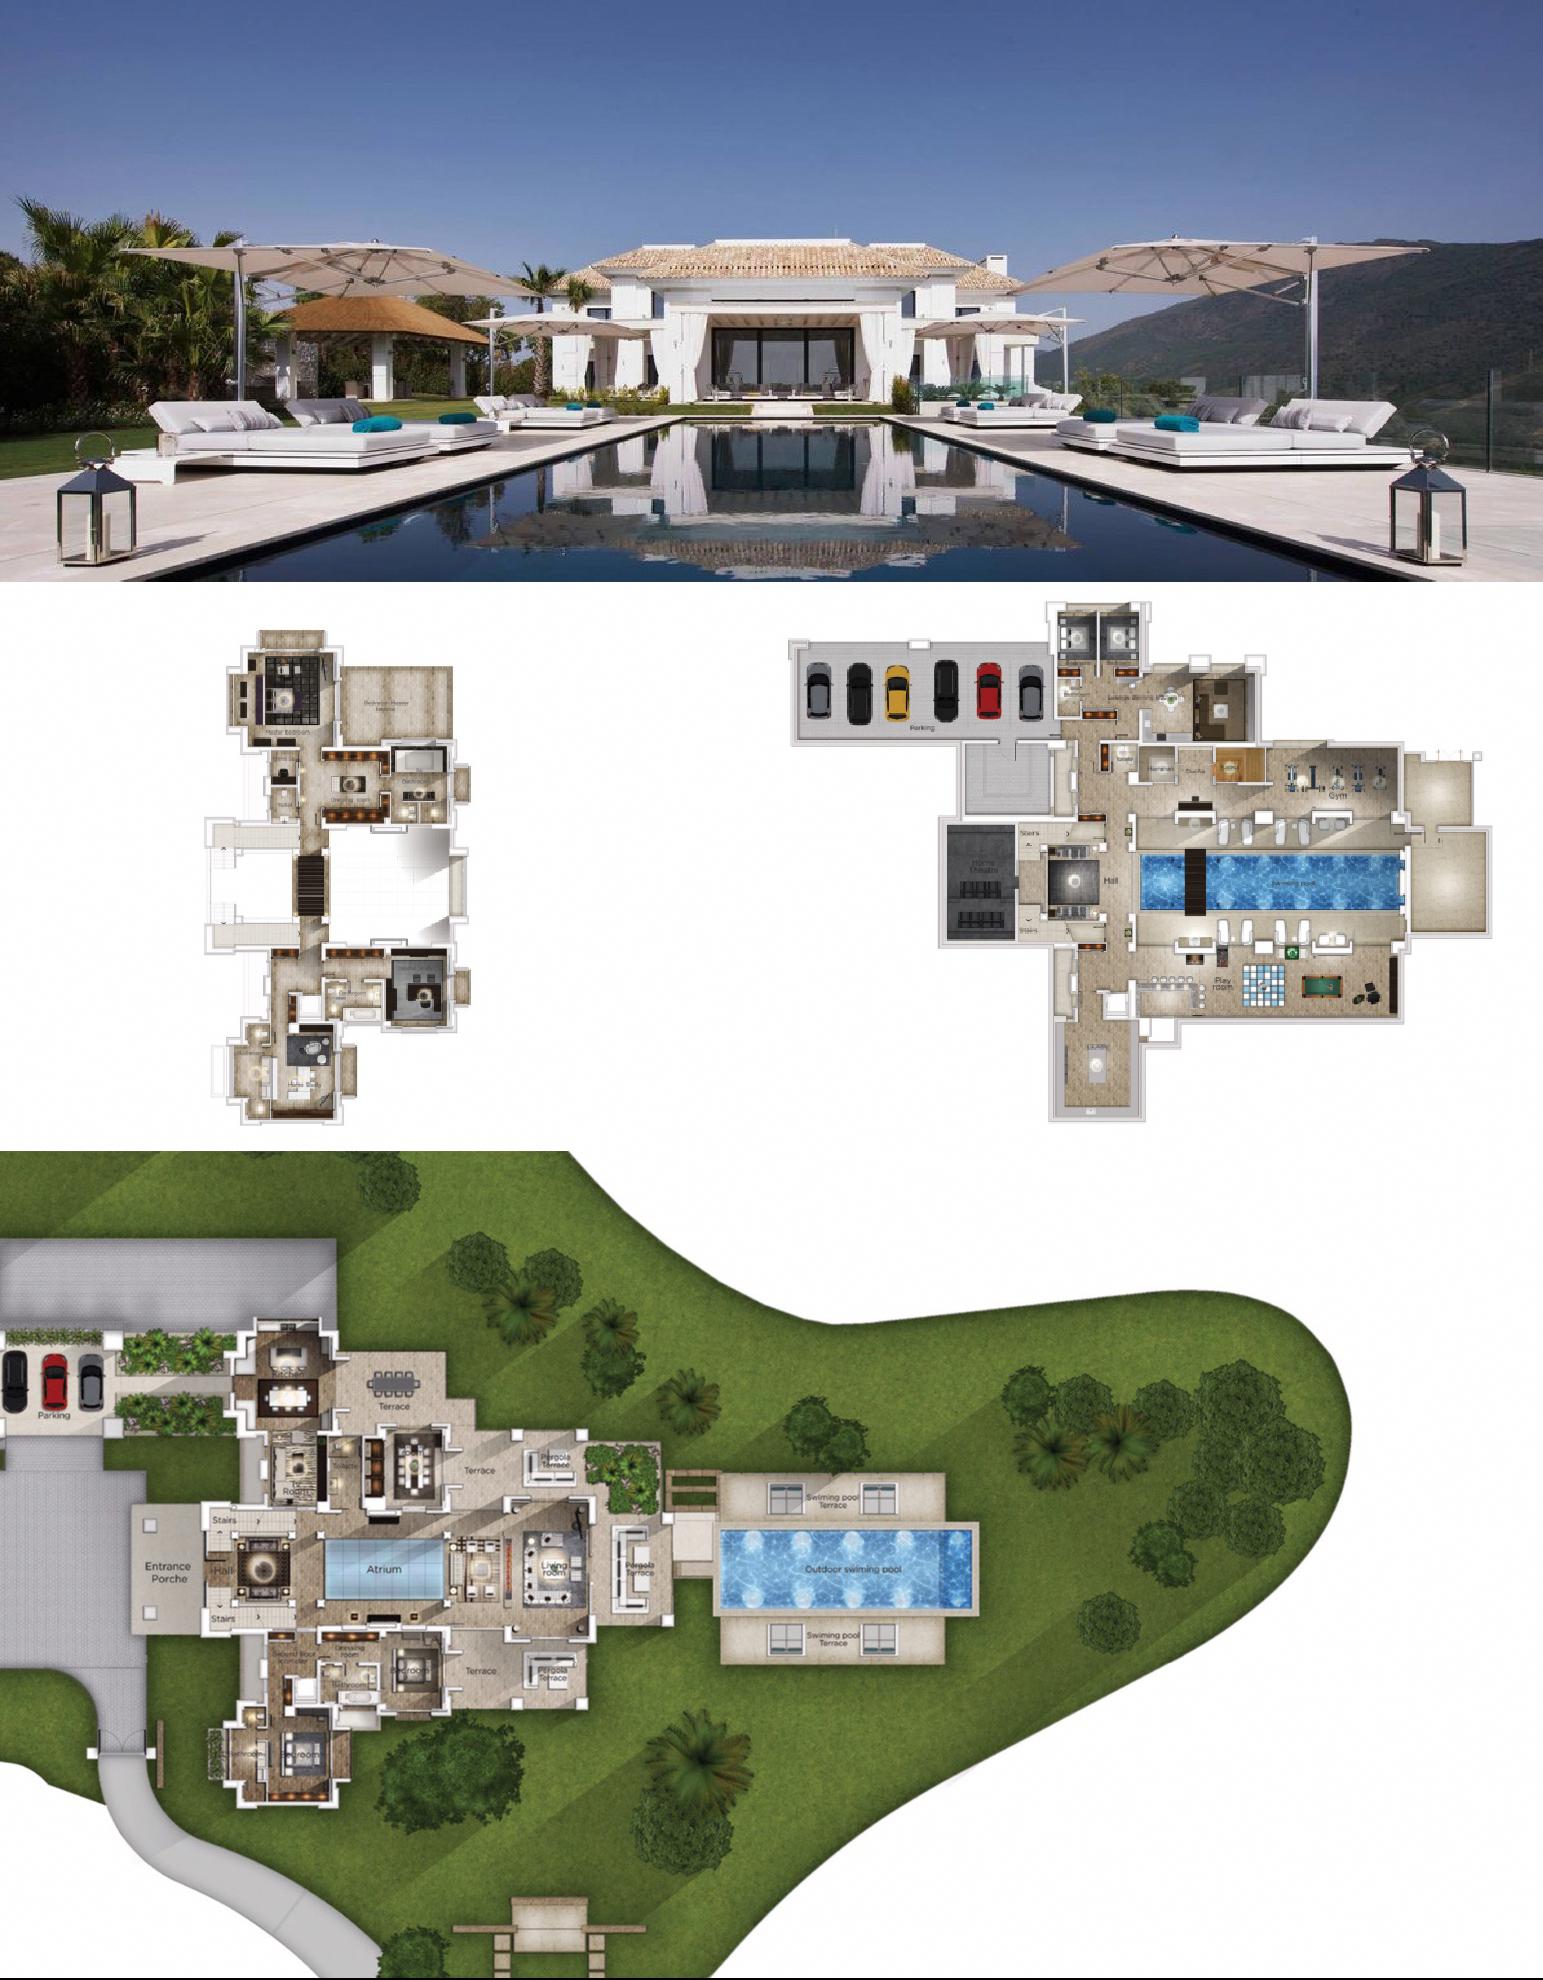 e61ae010dbf638927807e8ea12252f75 - Villas & Terraces At The Ambassador Gardens